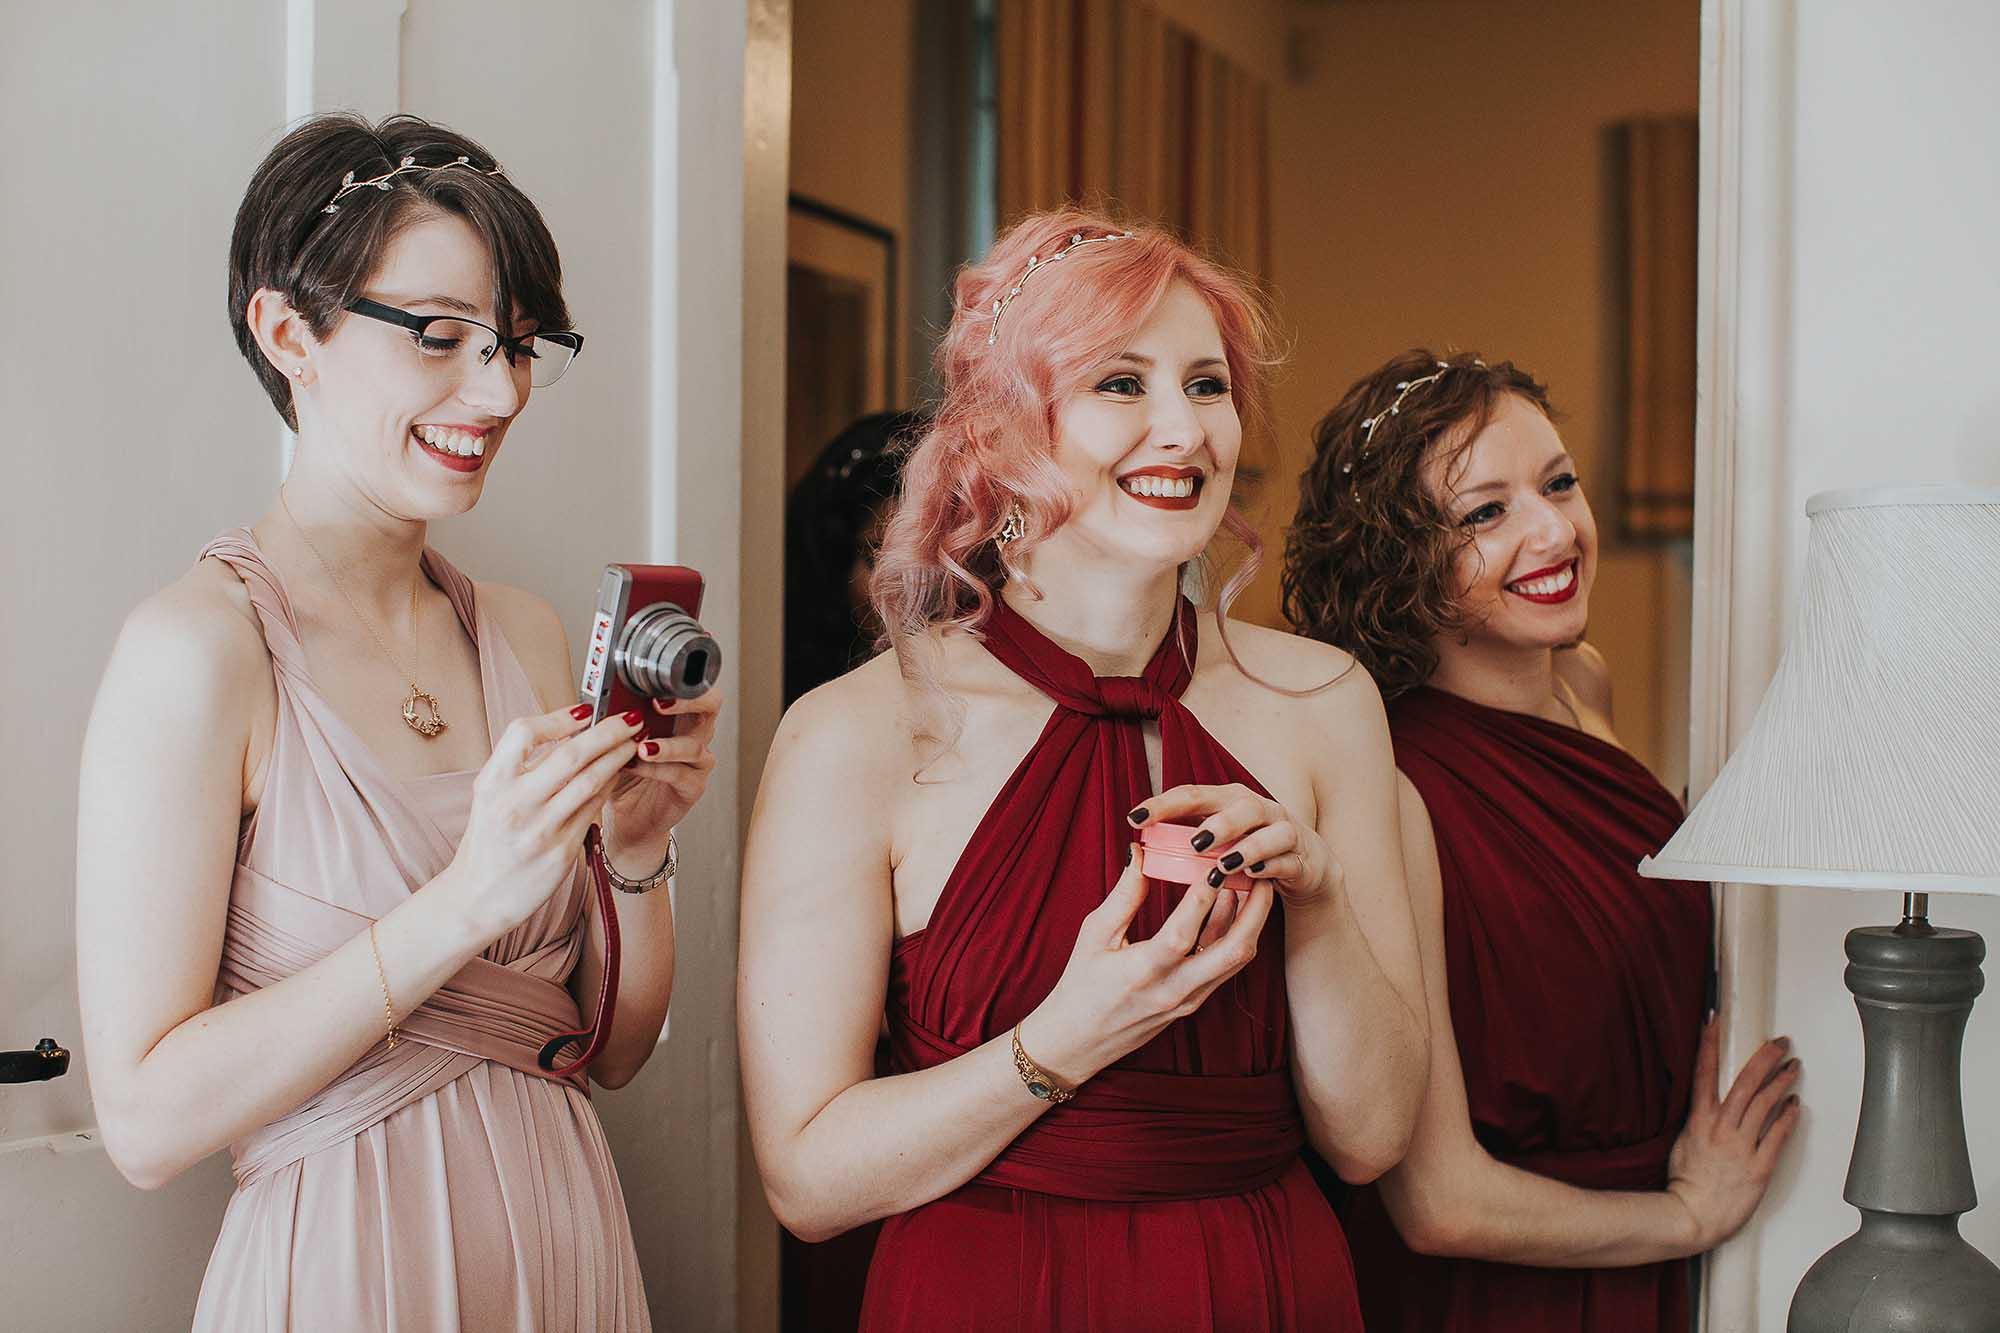 Samlesbury Hall wedding photographer